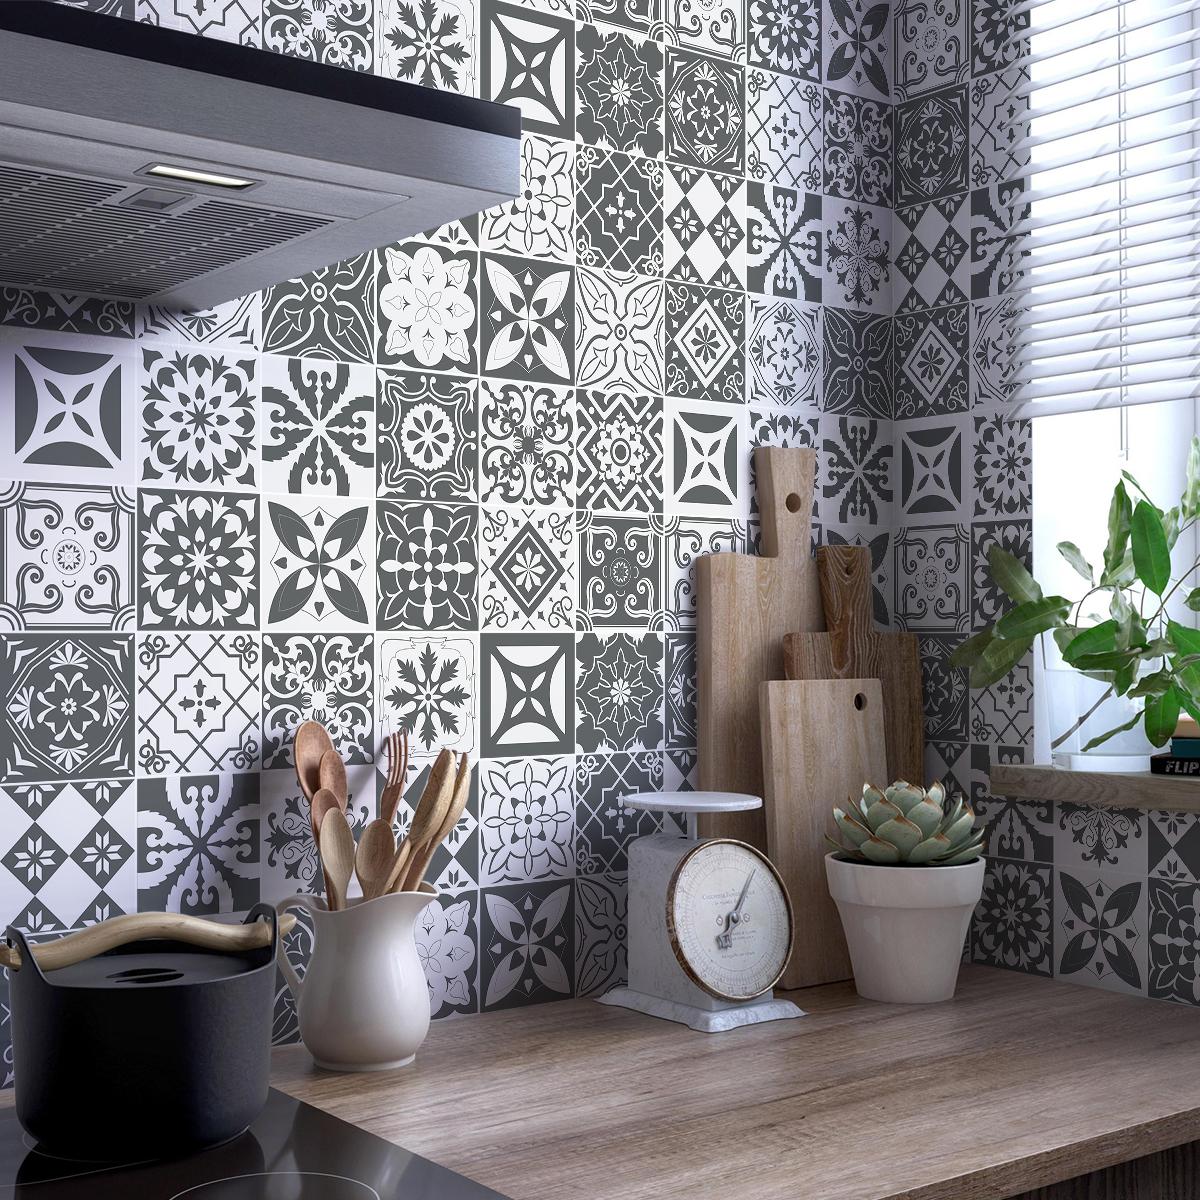 Awesome Frise Vinyle Cuisine Gallery - House Design - marcomilone.com